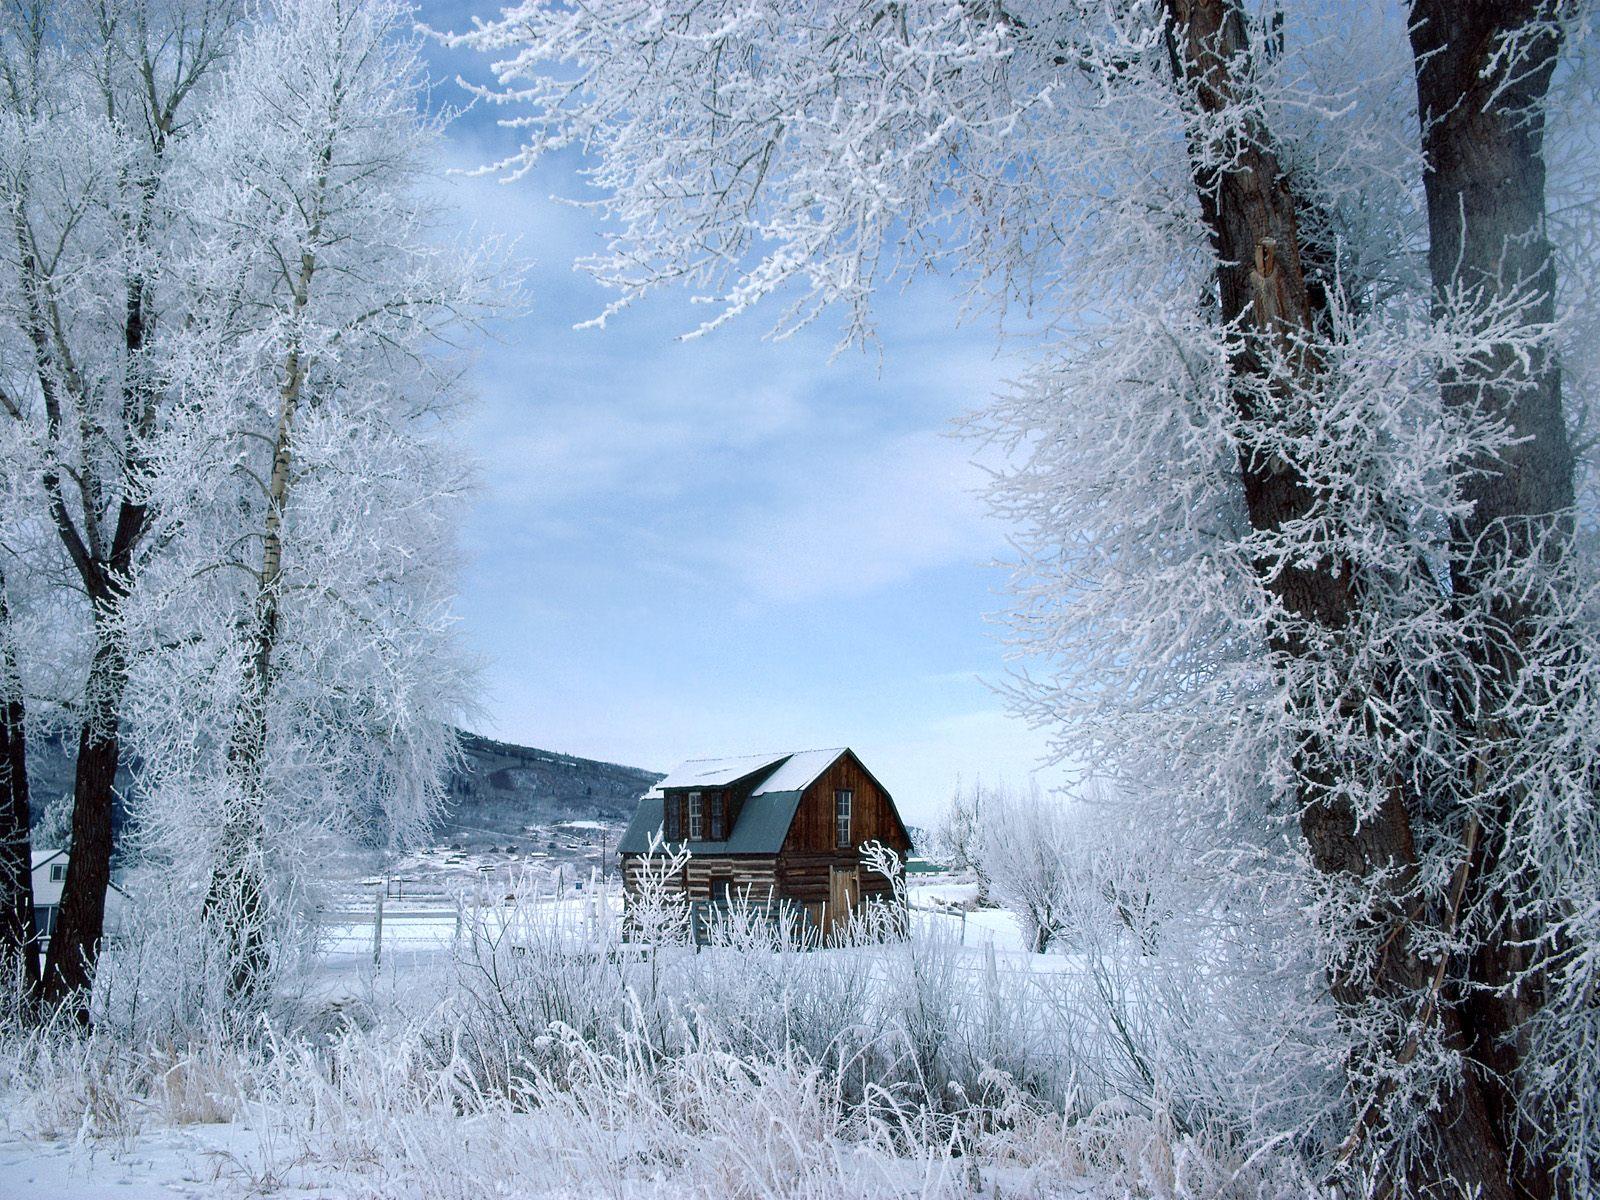 16001200 Winter wonderland Dreamy Snow Scene wallpaper 1600x1200